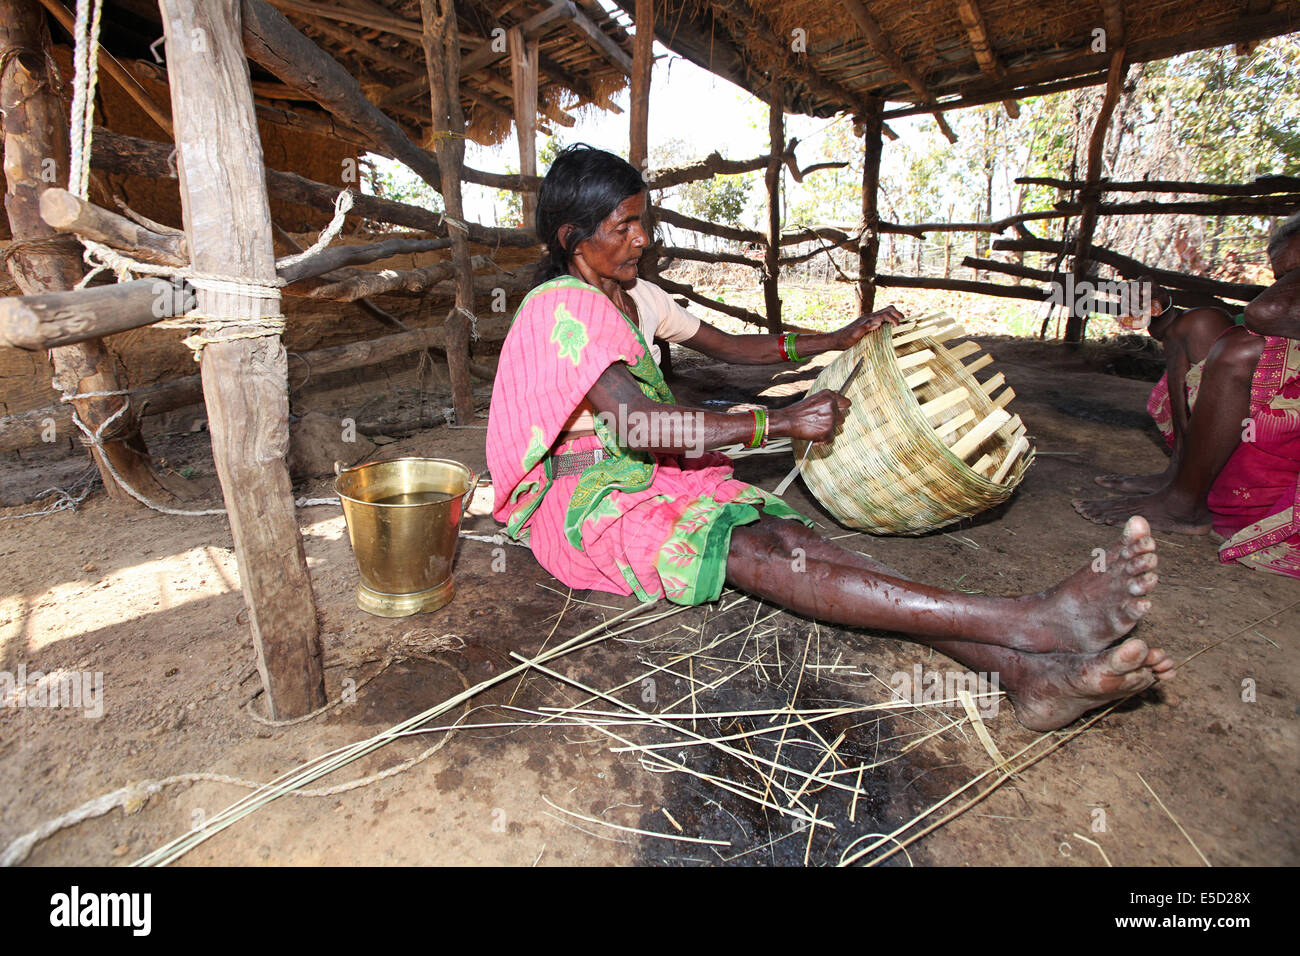 Tribal woman making baskets with dry bamboo strips. Birhor tribe, Chueya Village, Korba District, Chattisgadh, India - Stock Image